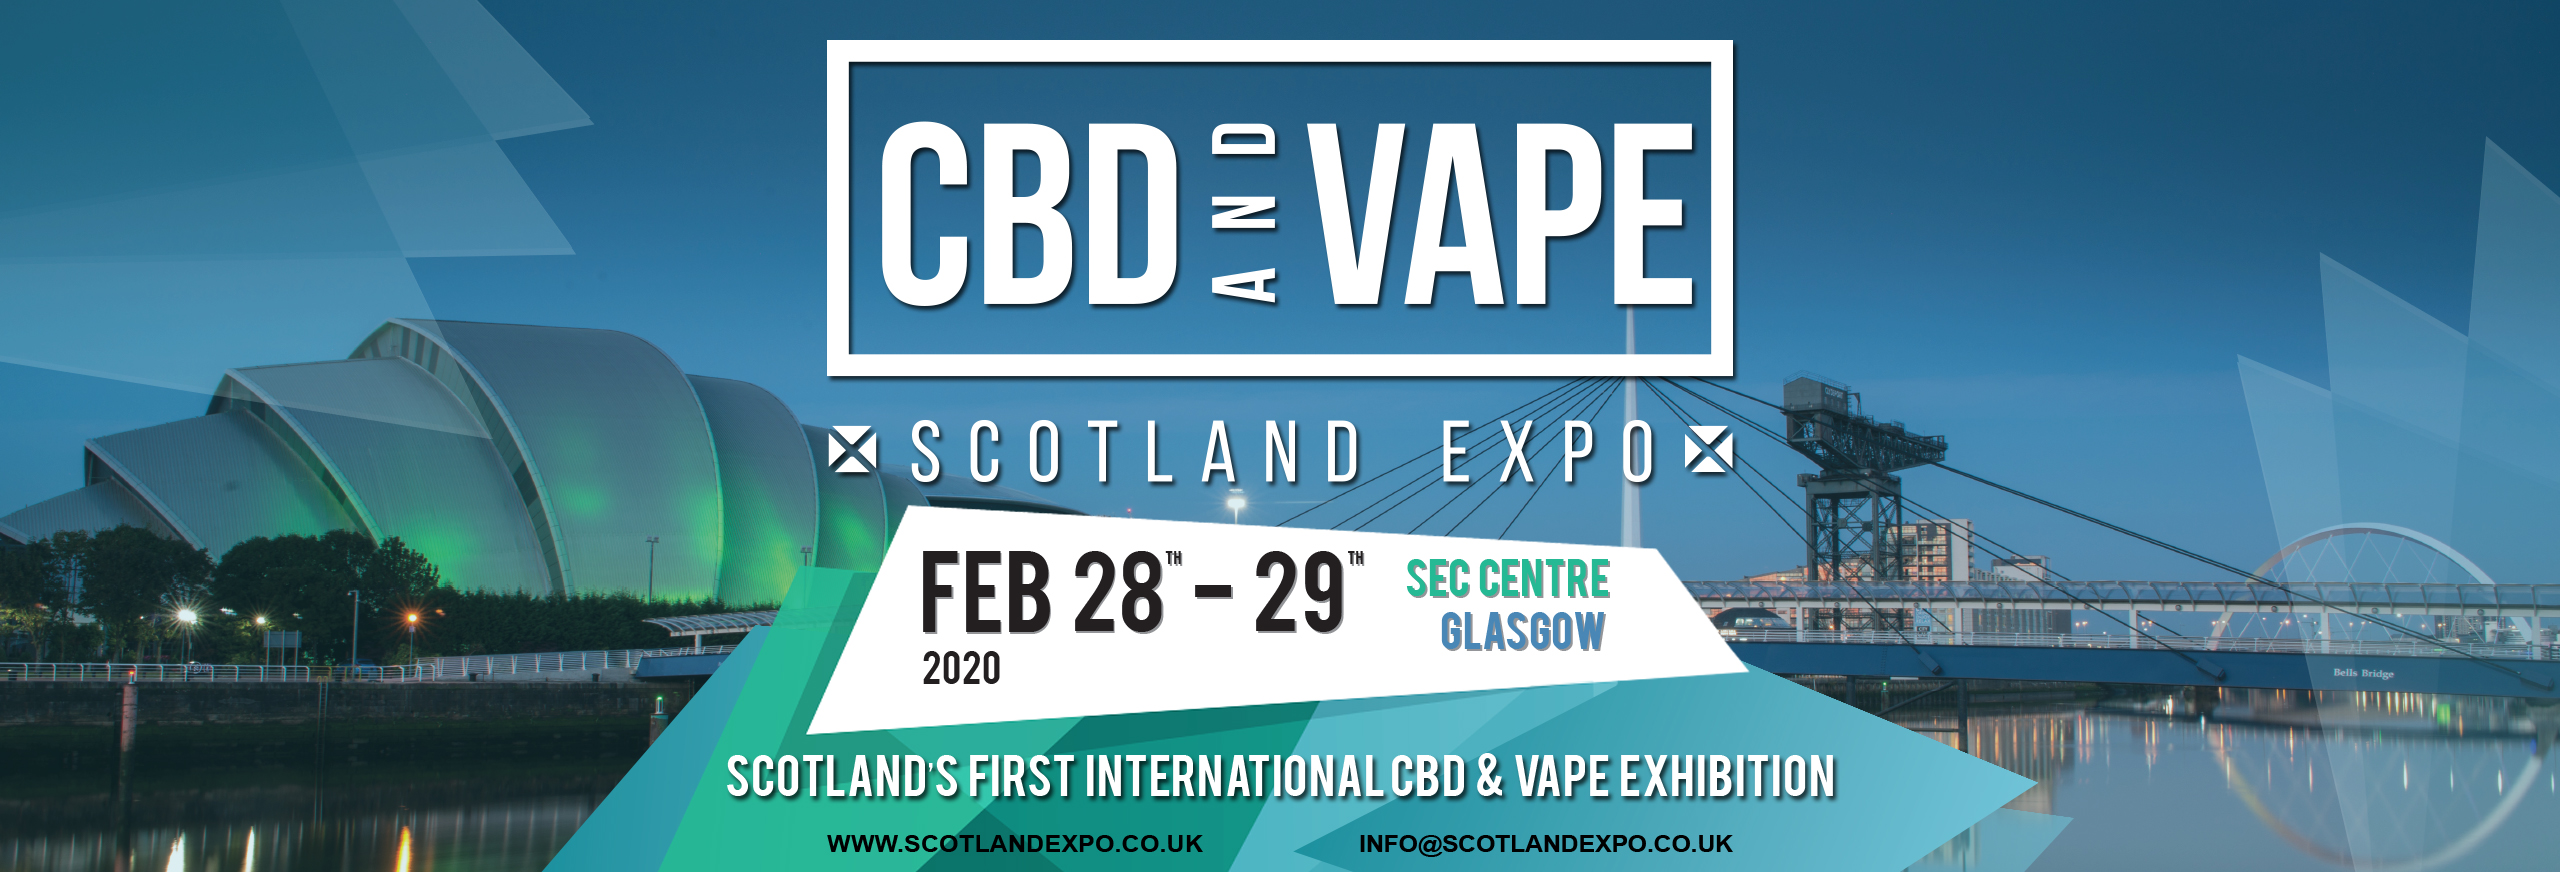 CBD and Vape Scotland Expo 2020